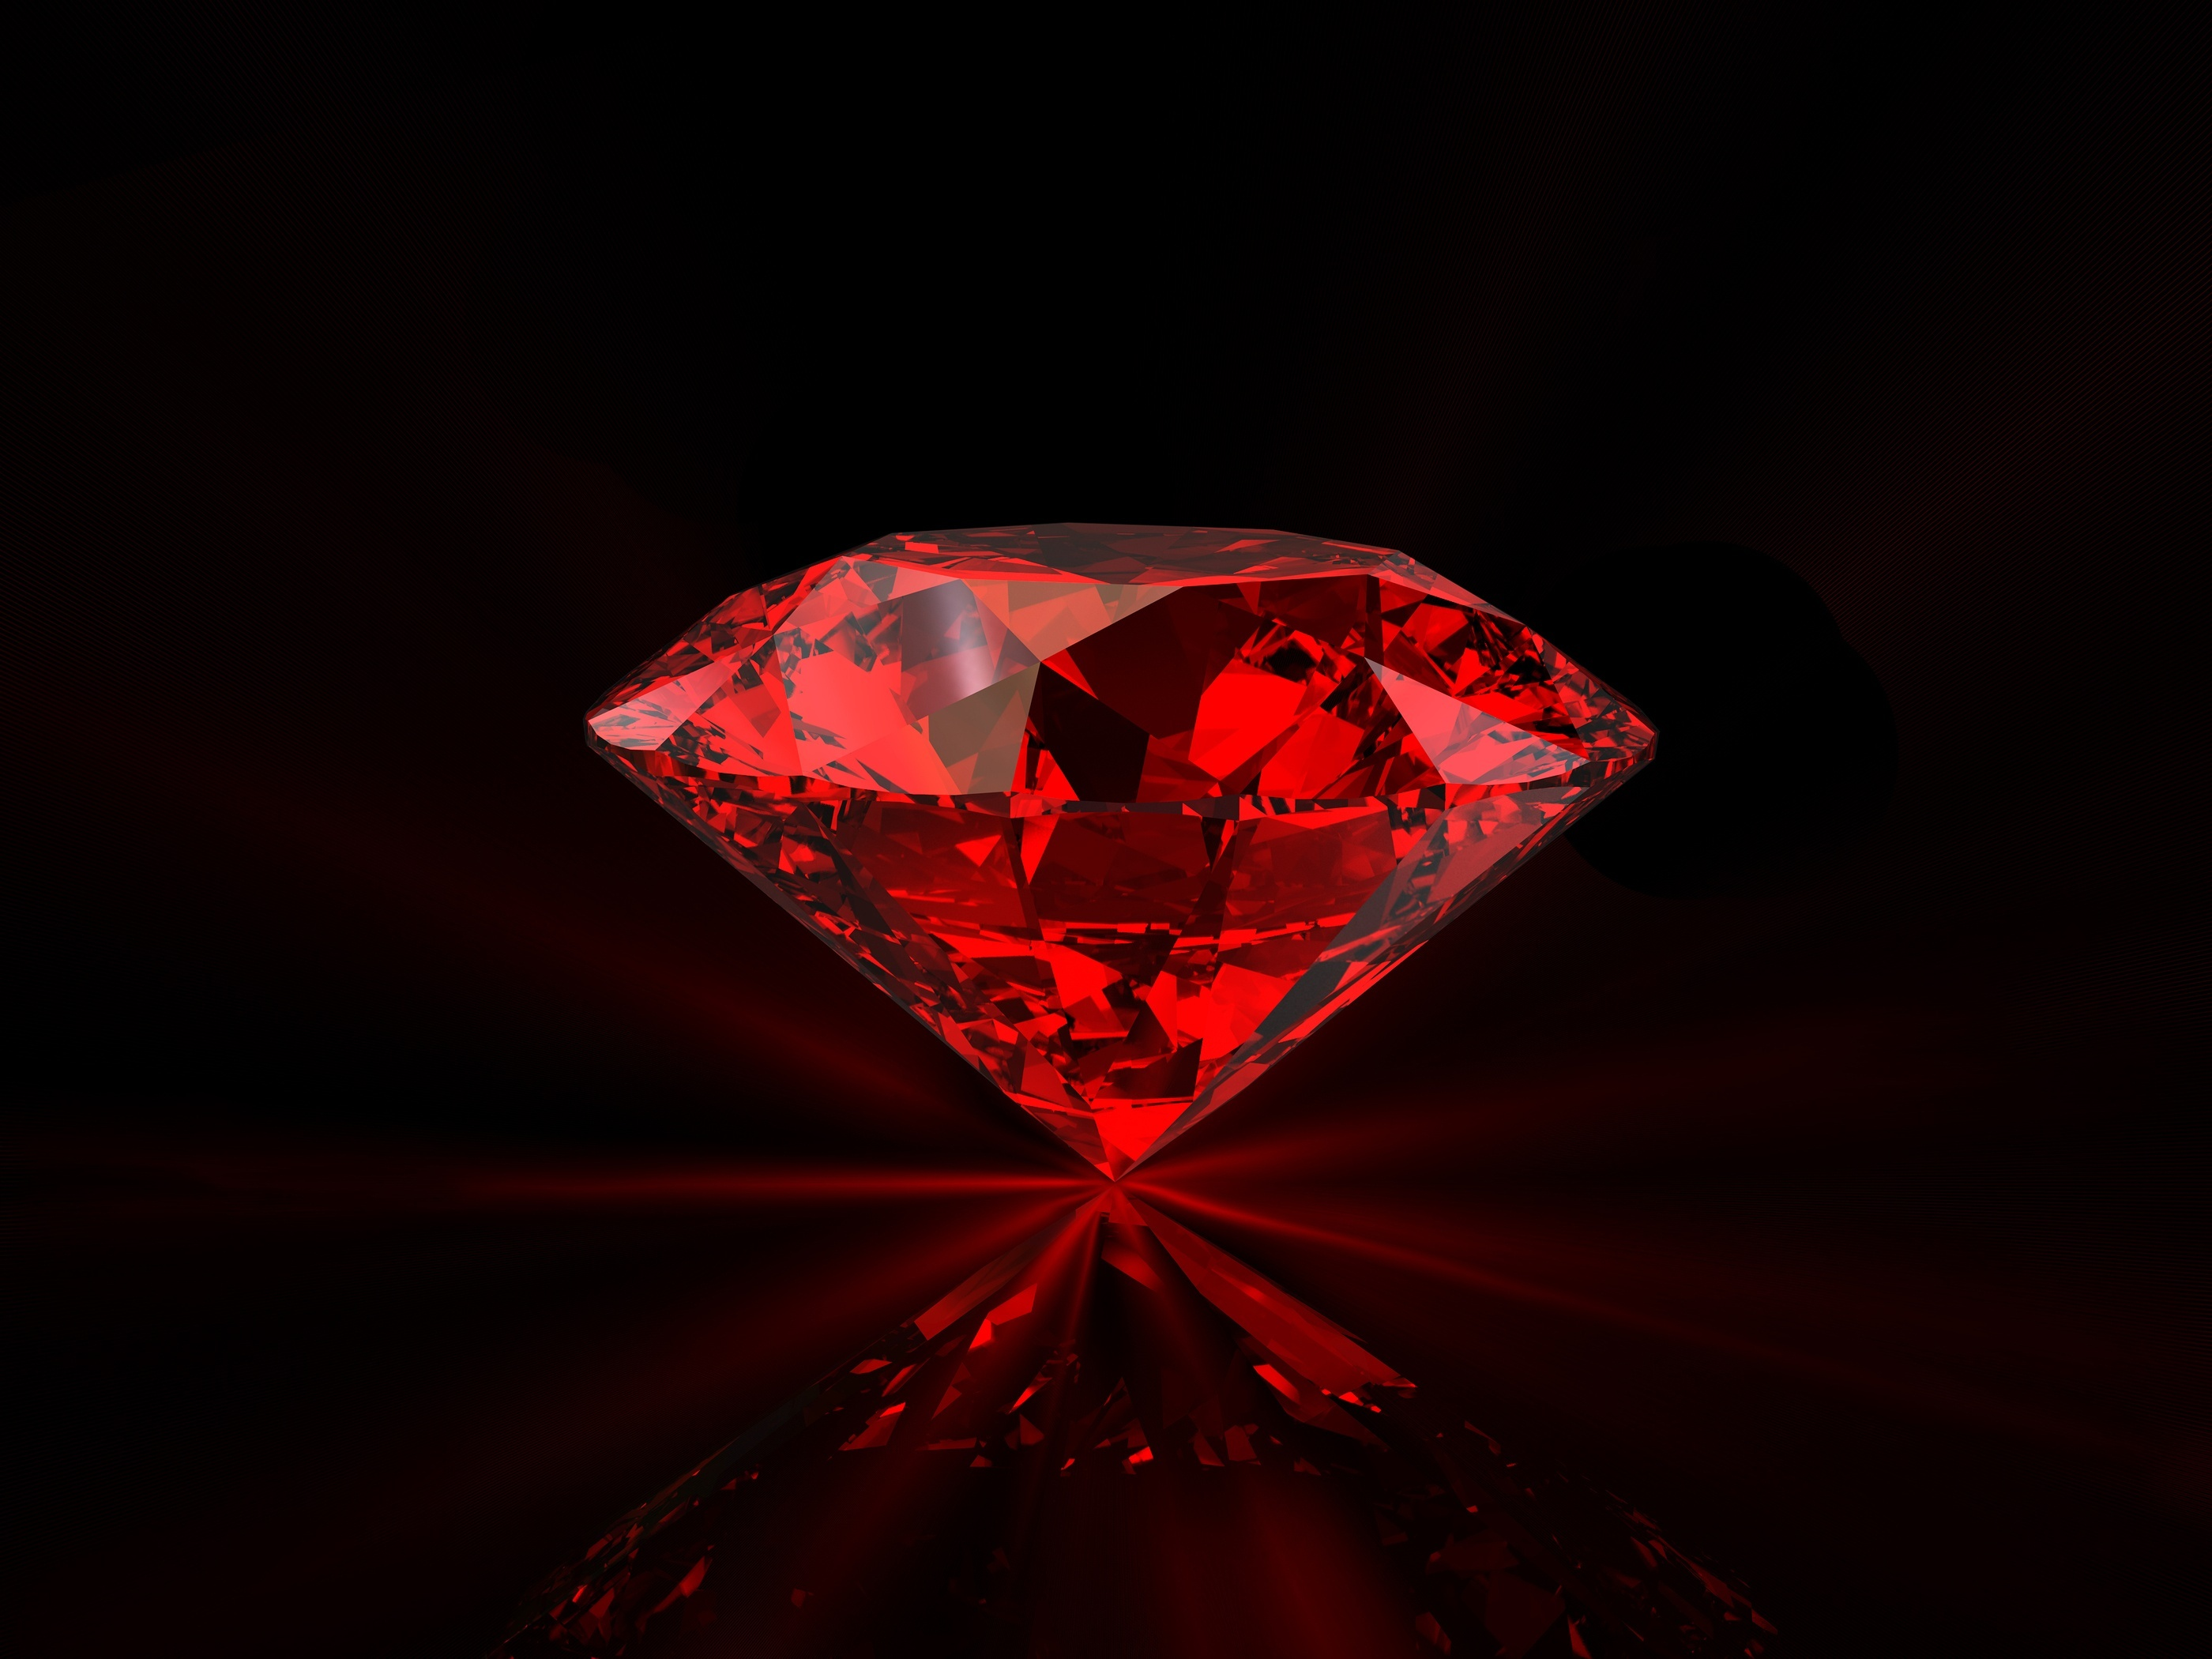 bigstock-Red-Diamond-On-Black-Backgroun-7398784-8